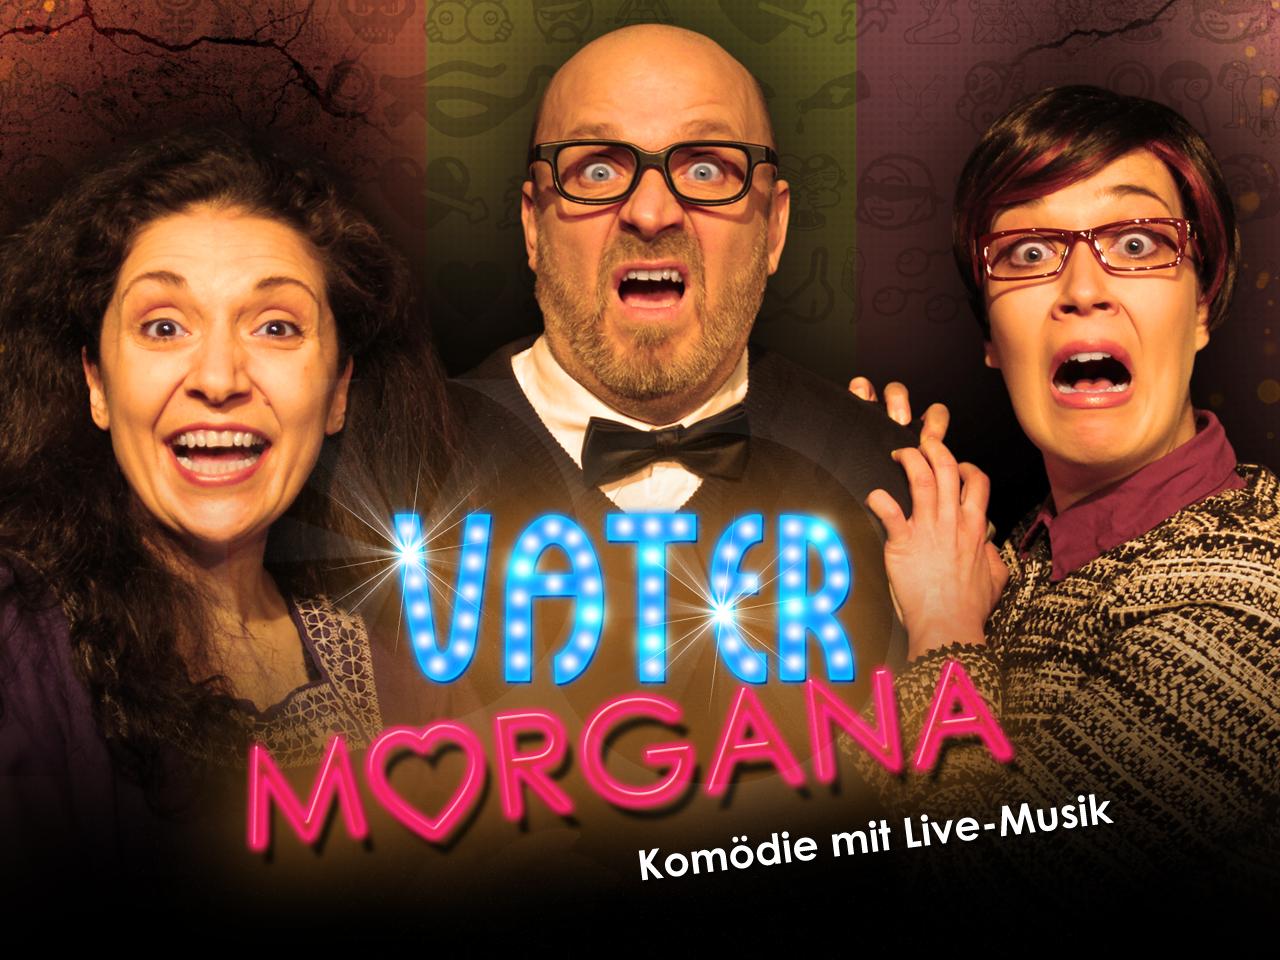 Vater Morgana - Komödie mit Livemusik